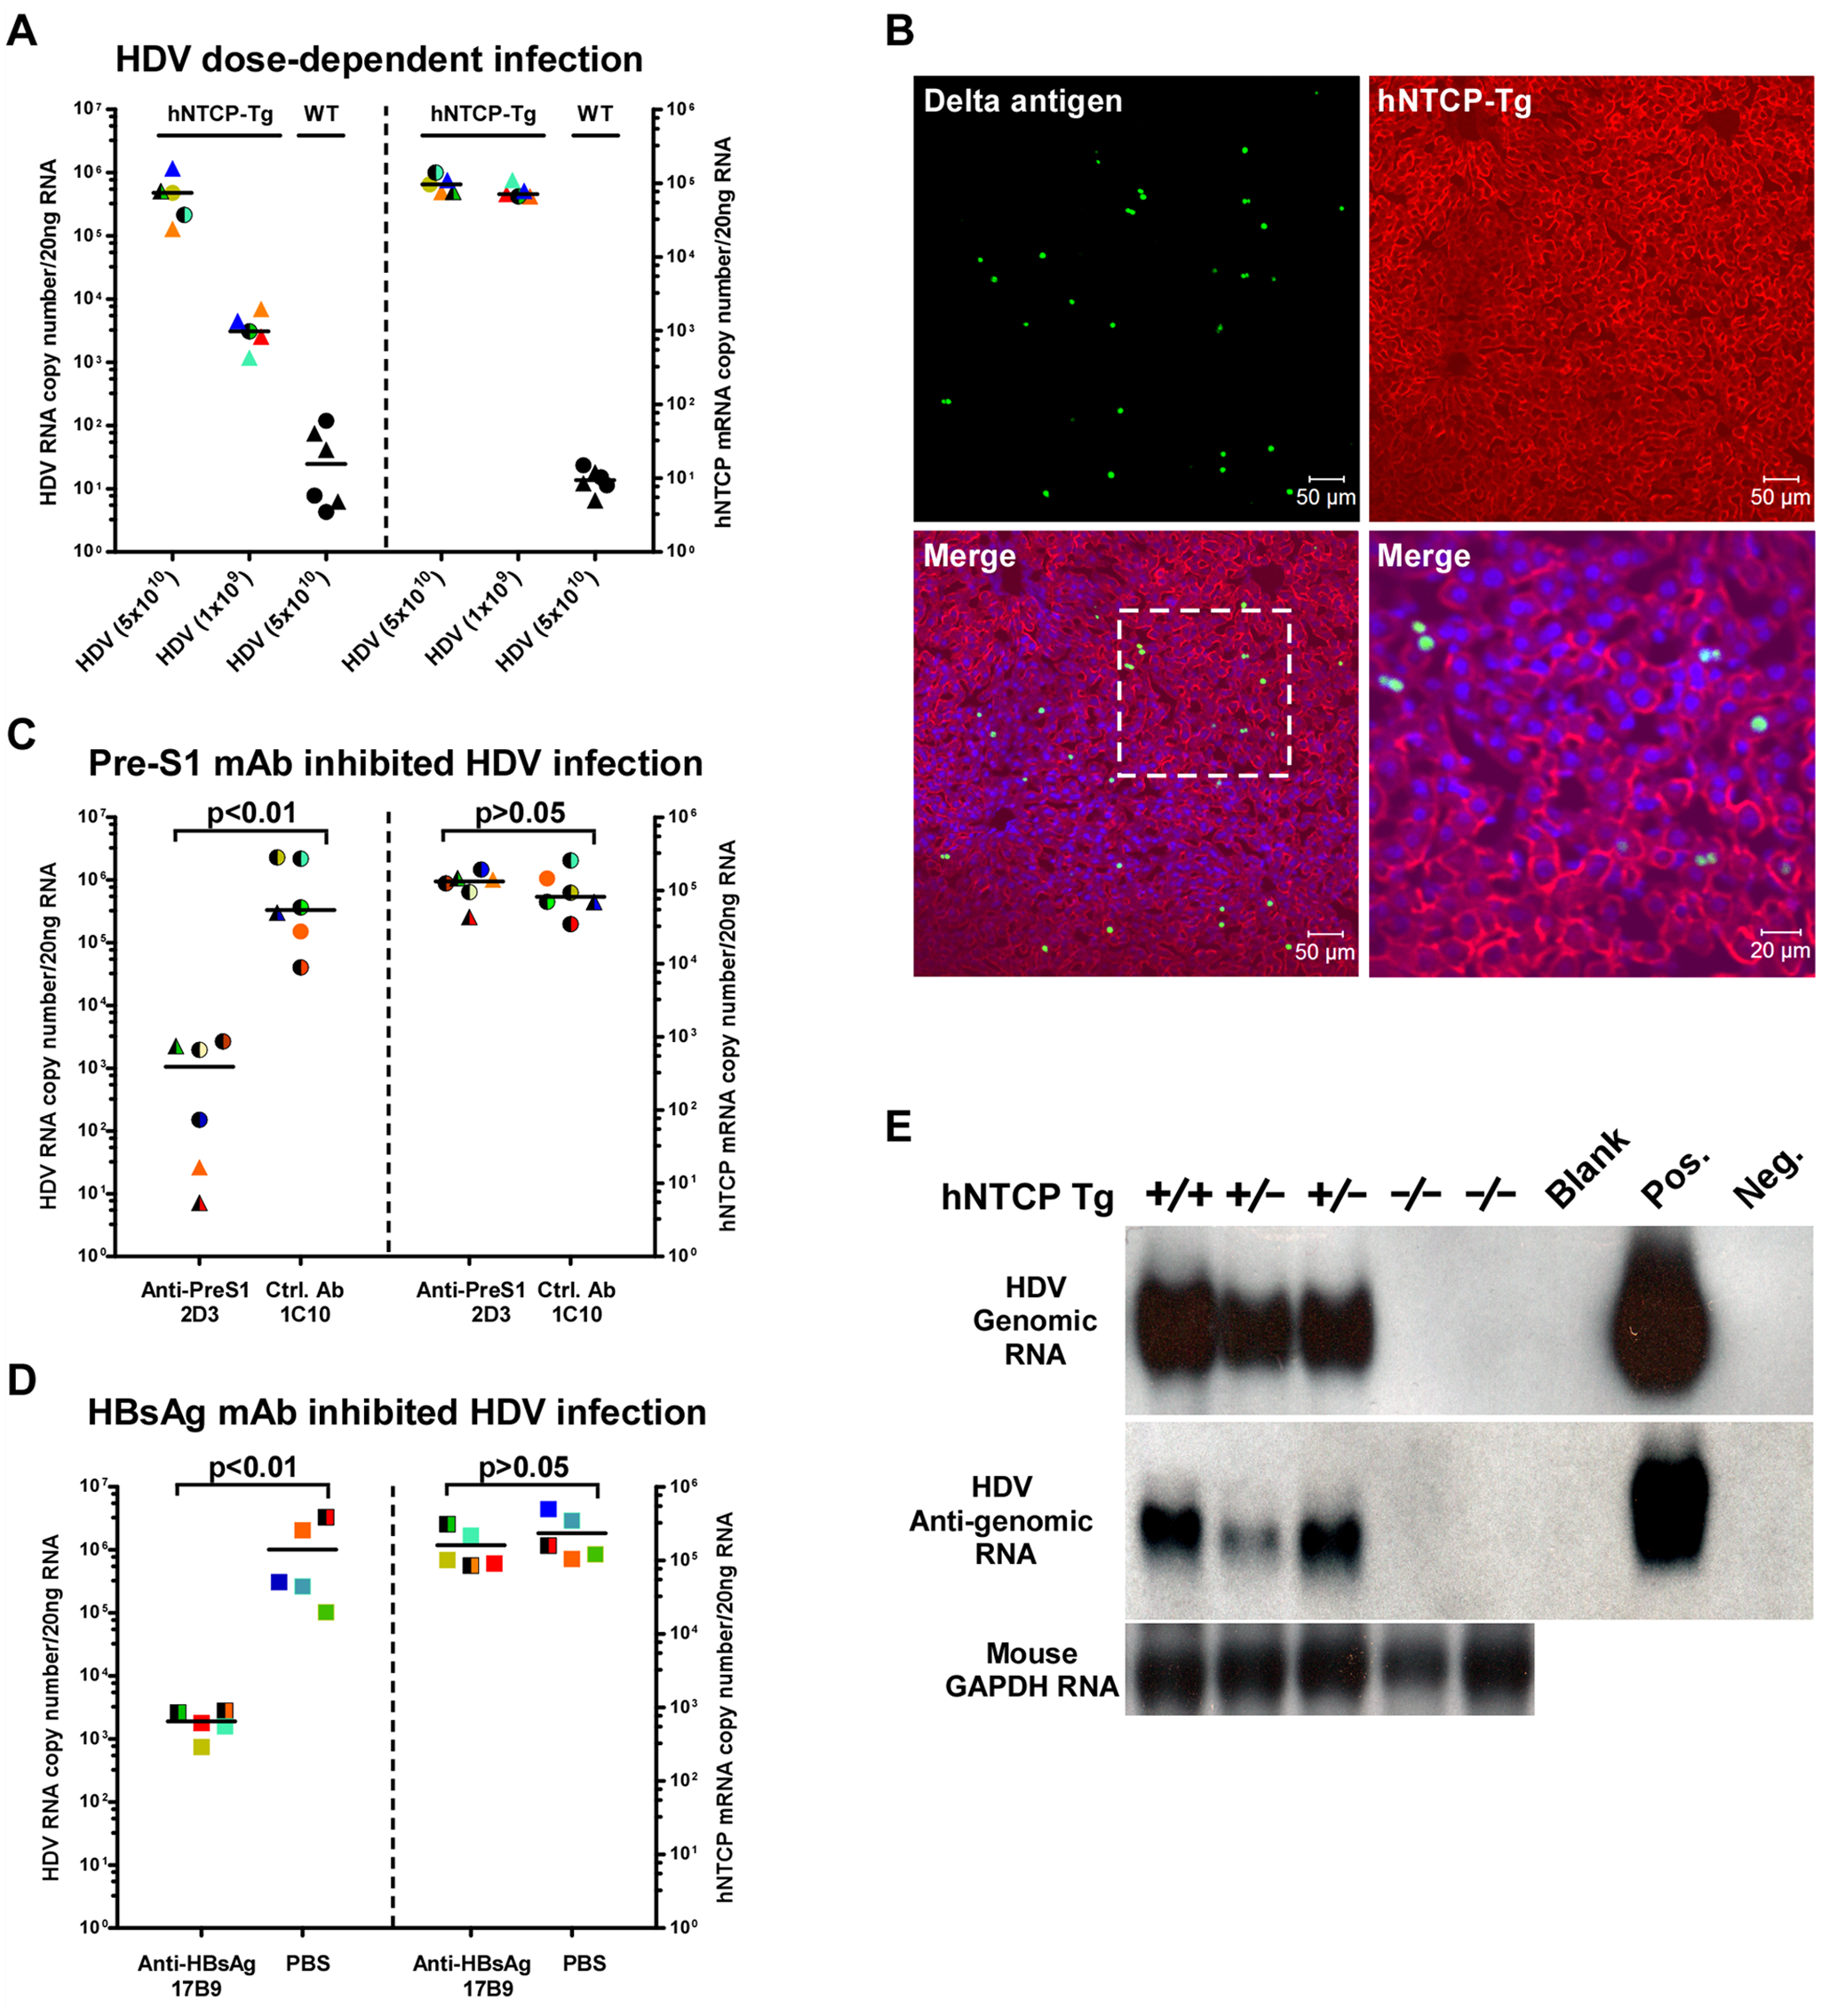 HDV infects human NTCP transgenic mice <i>in vivo</i>.